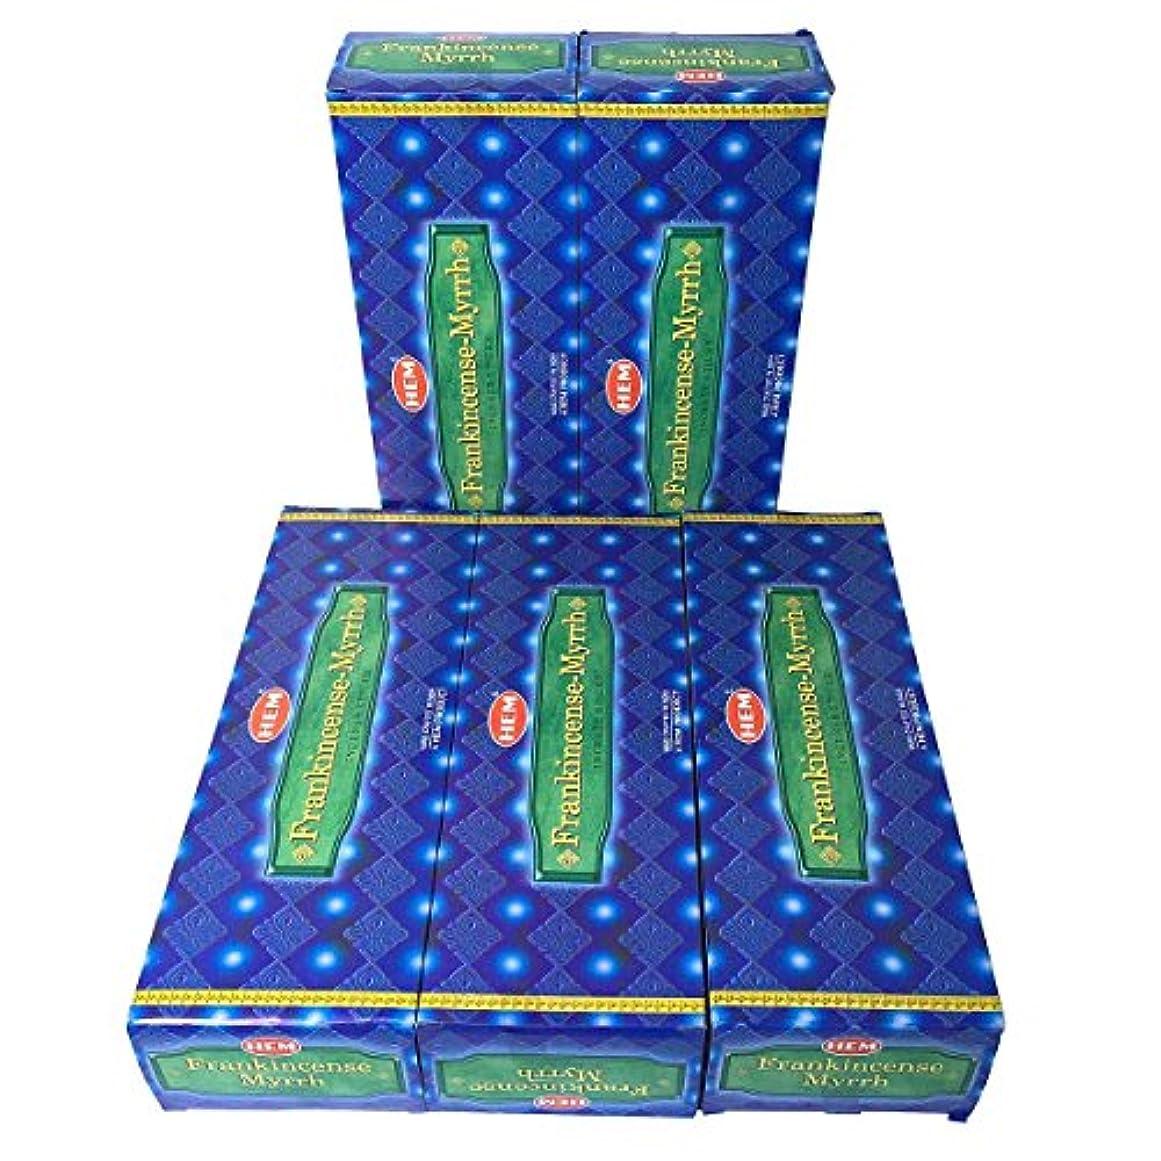 HEM フランキンセンス-ミルラ香 スティック 5BOX(30箱)/HEM FRANKINCENSE MYRRH/ インド香 / 送料無料 [並行輸入品]